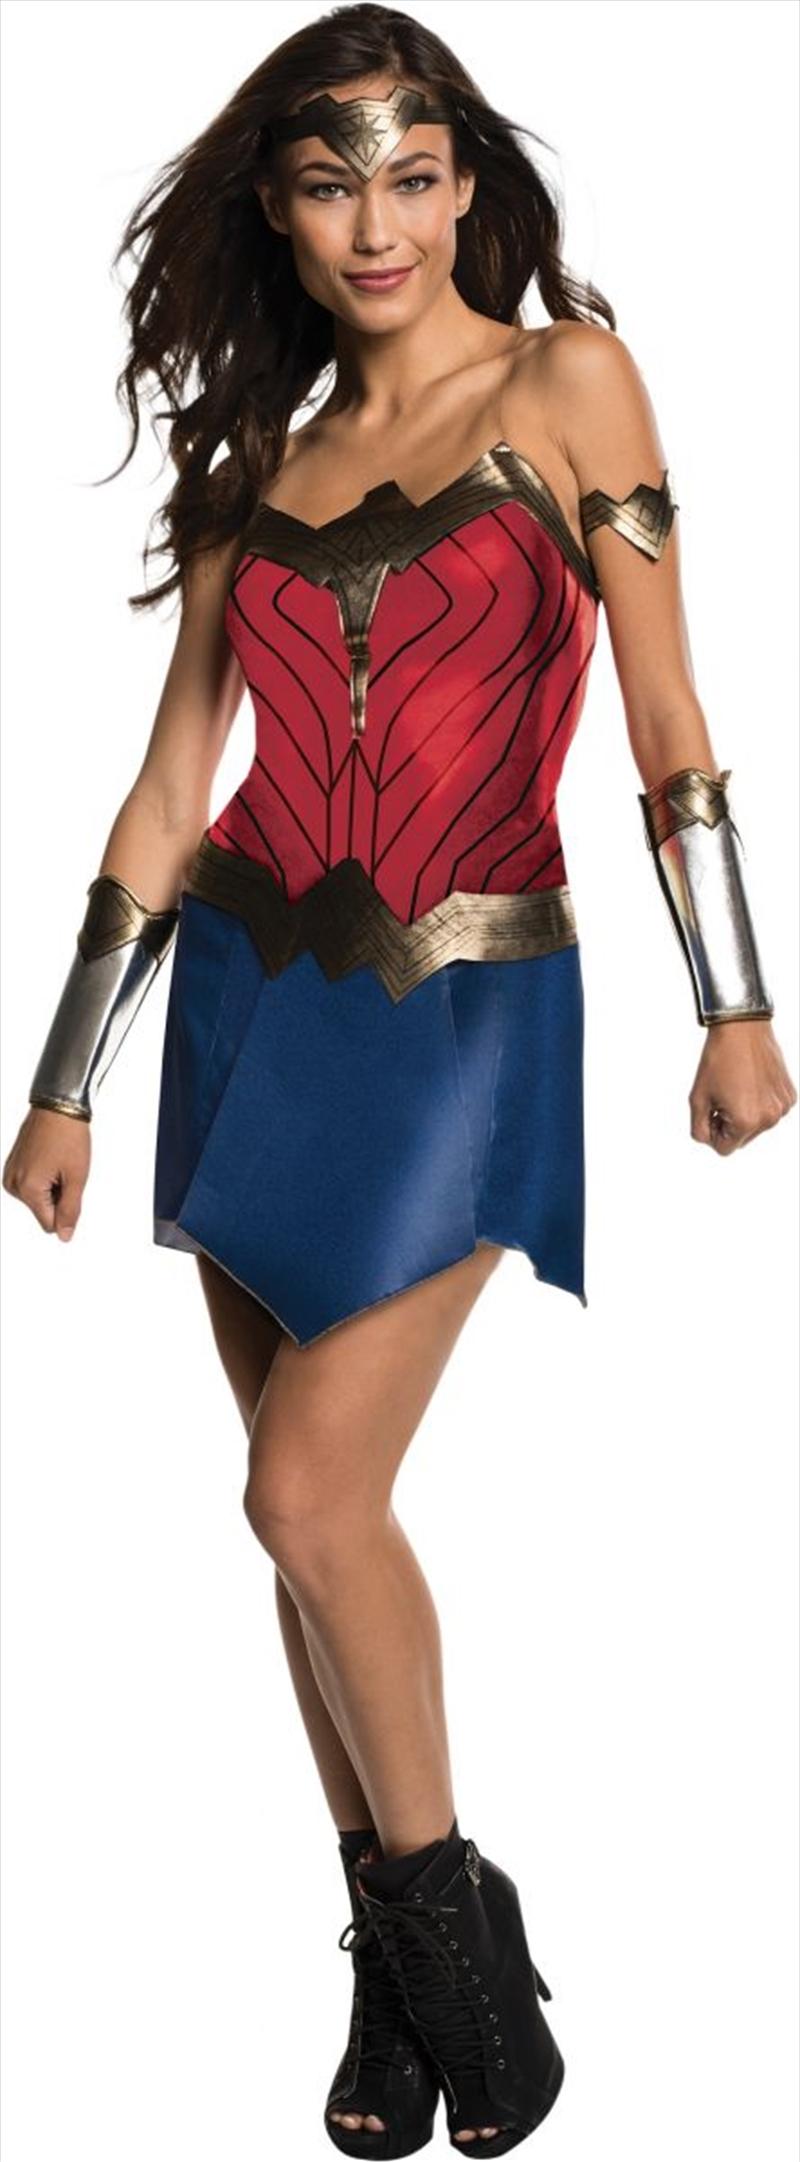 Wonder Woman Classic Costume (Medium) | Apparel